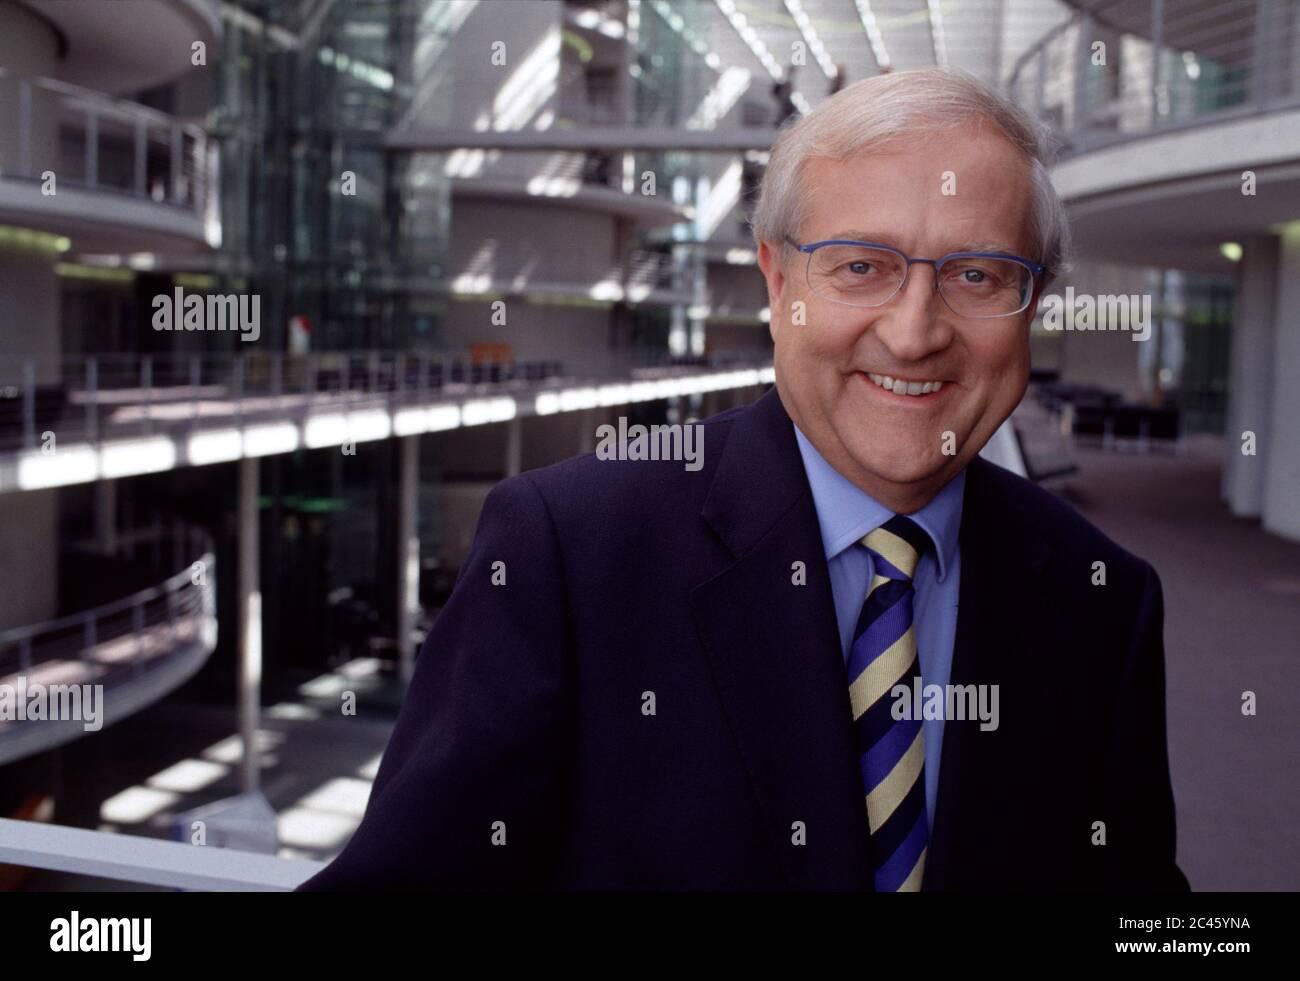 Rainer Brüderle - Member of the Federal FDP - FDP Rhineland-Palatinate - Germany Stock Photo